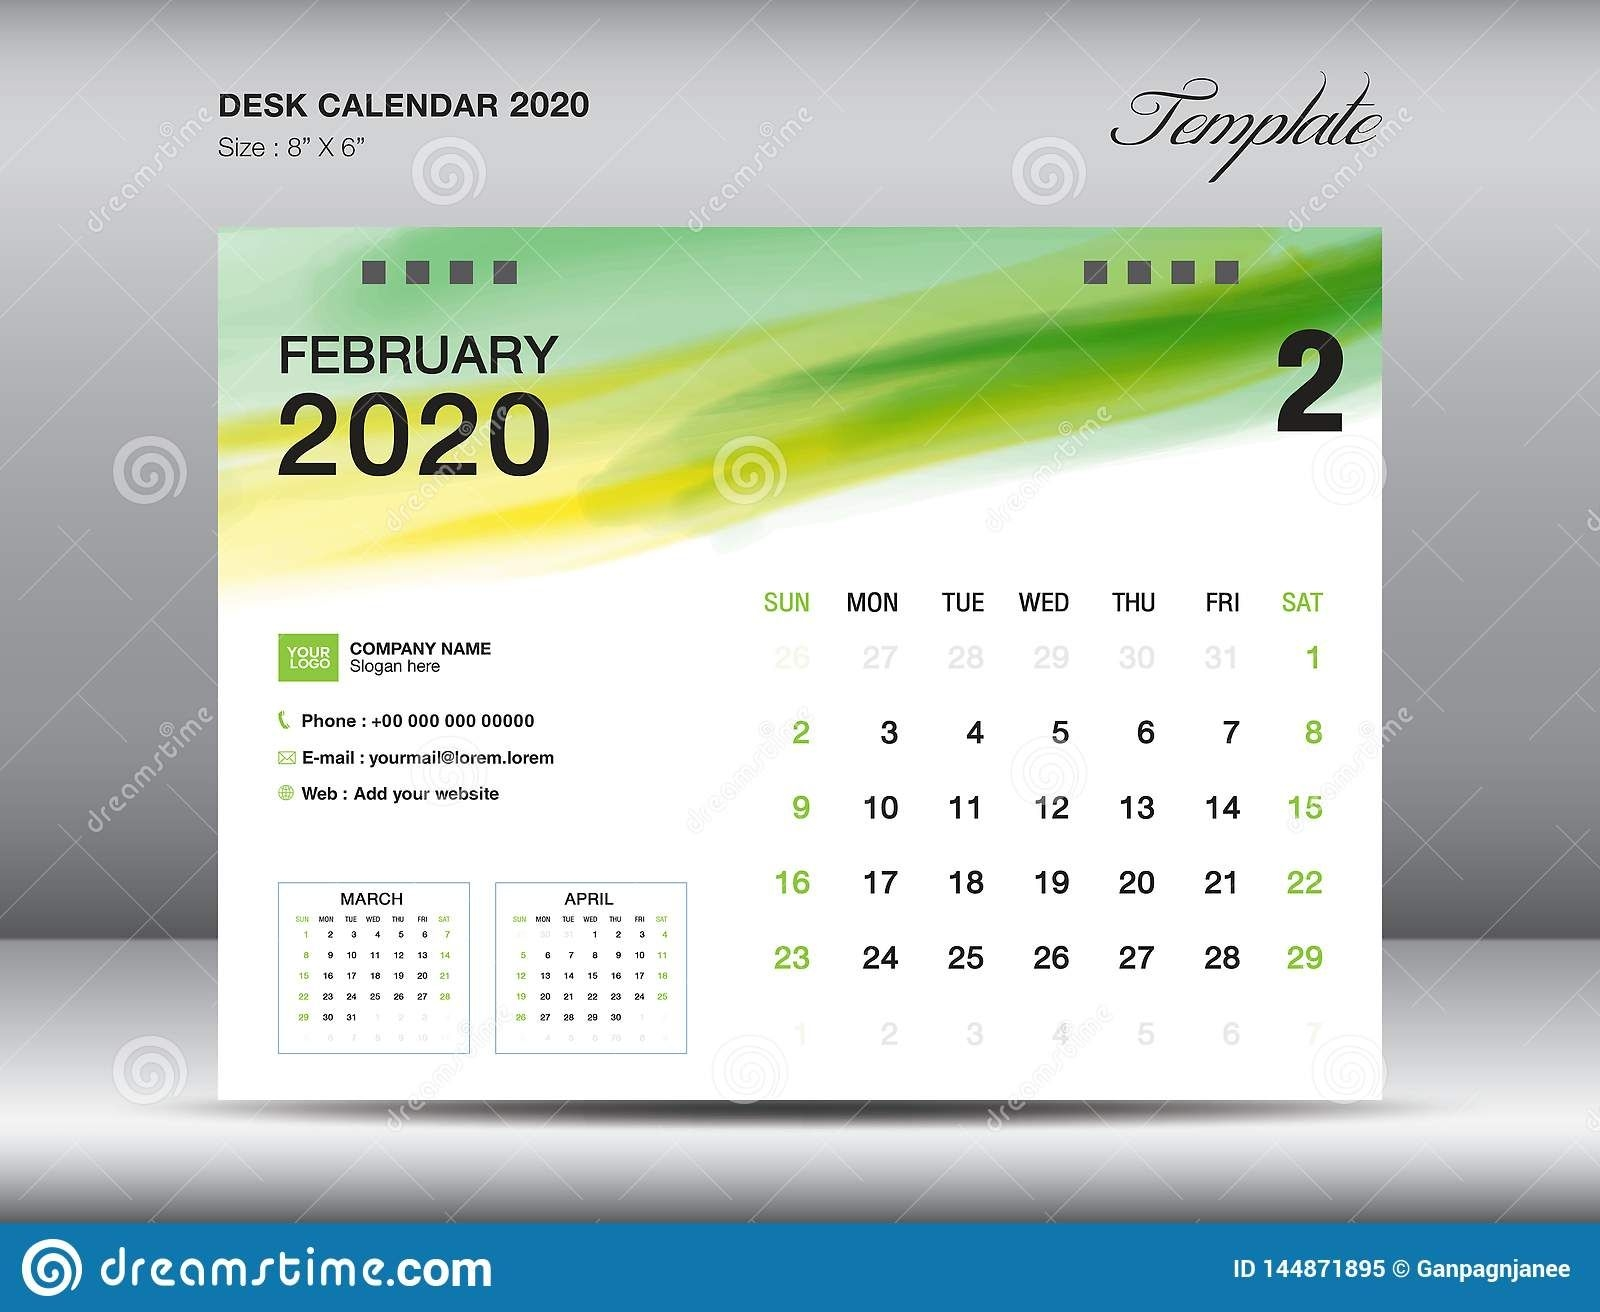 Desk Calendar 2020 Template Vector, February 2020 Month